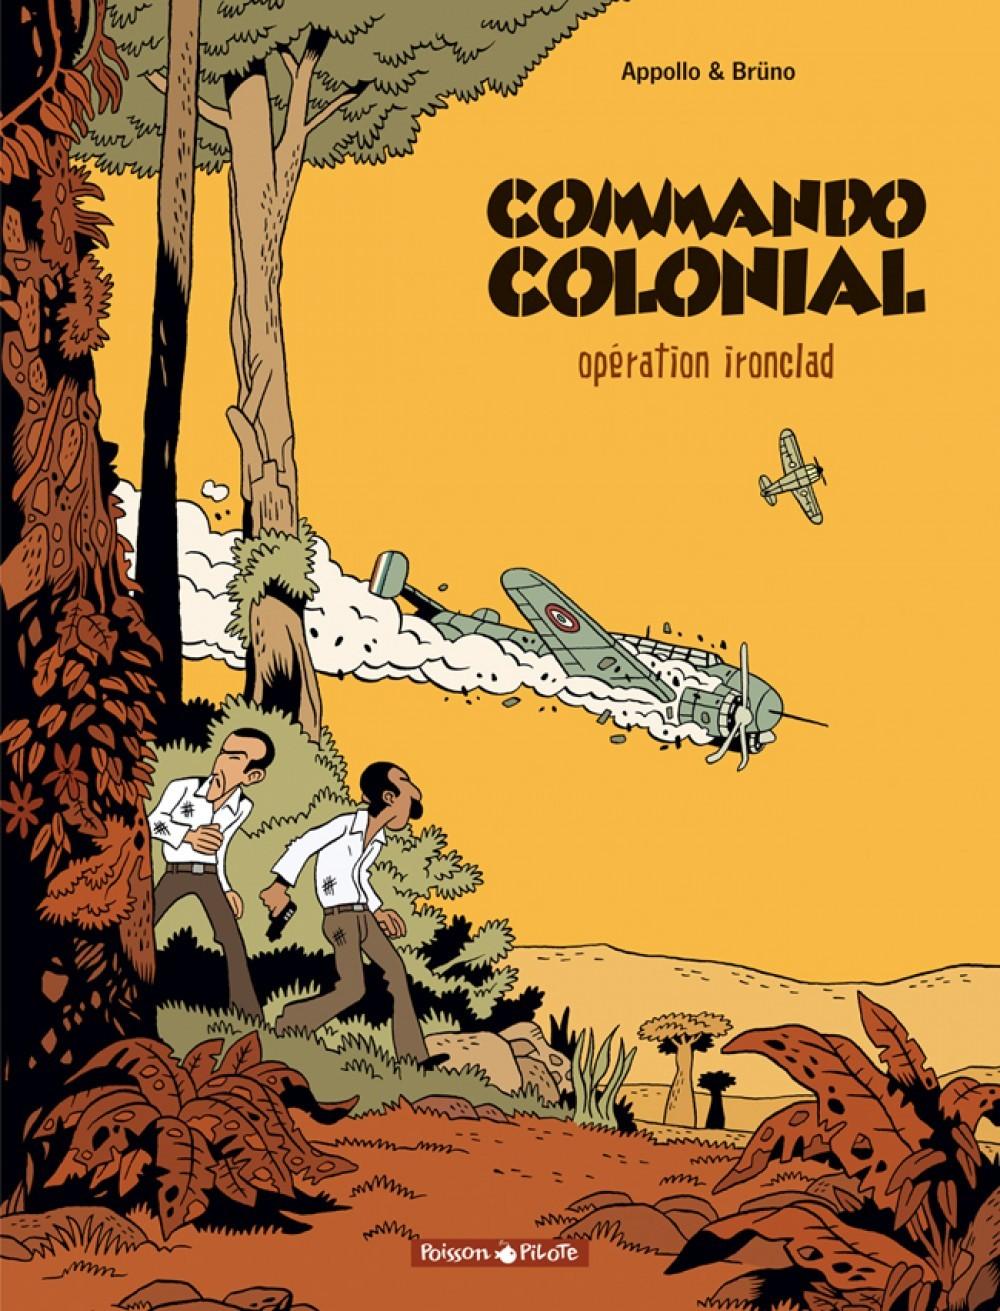 COMMANDO COLONIAL T1 COMMANDO COLONIAL T1